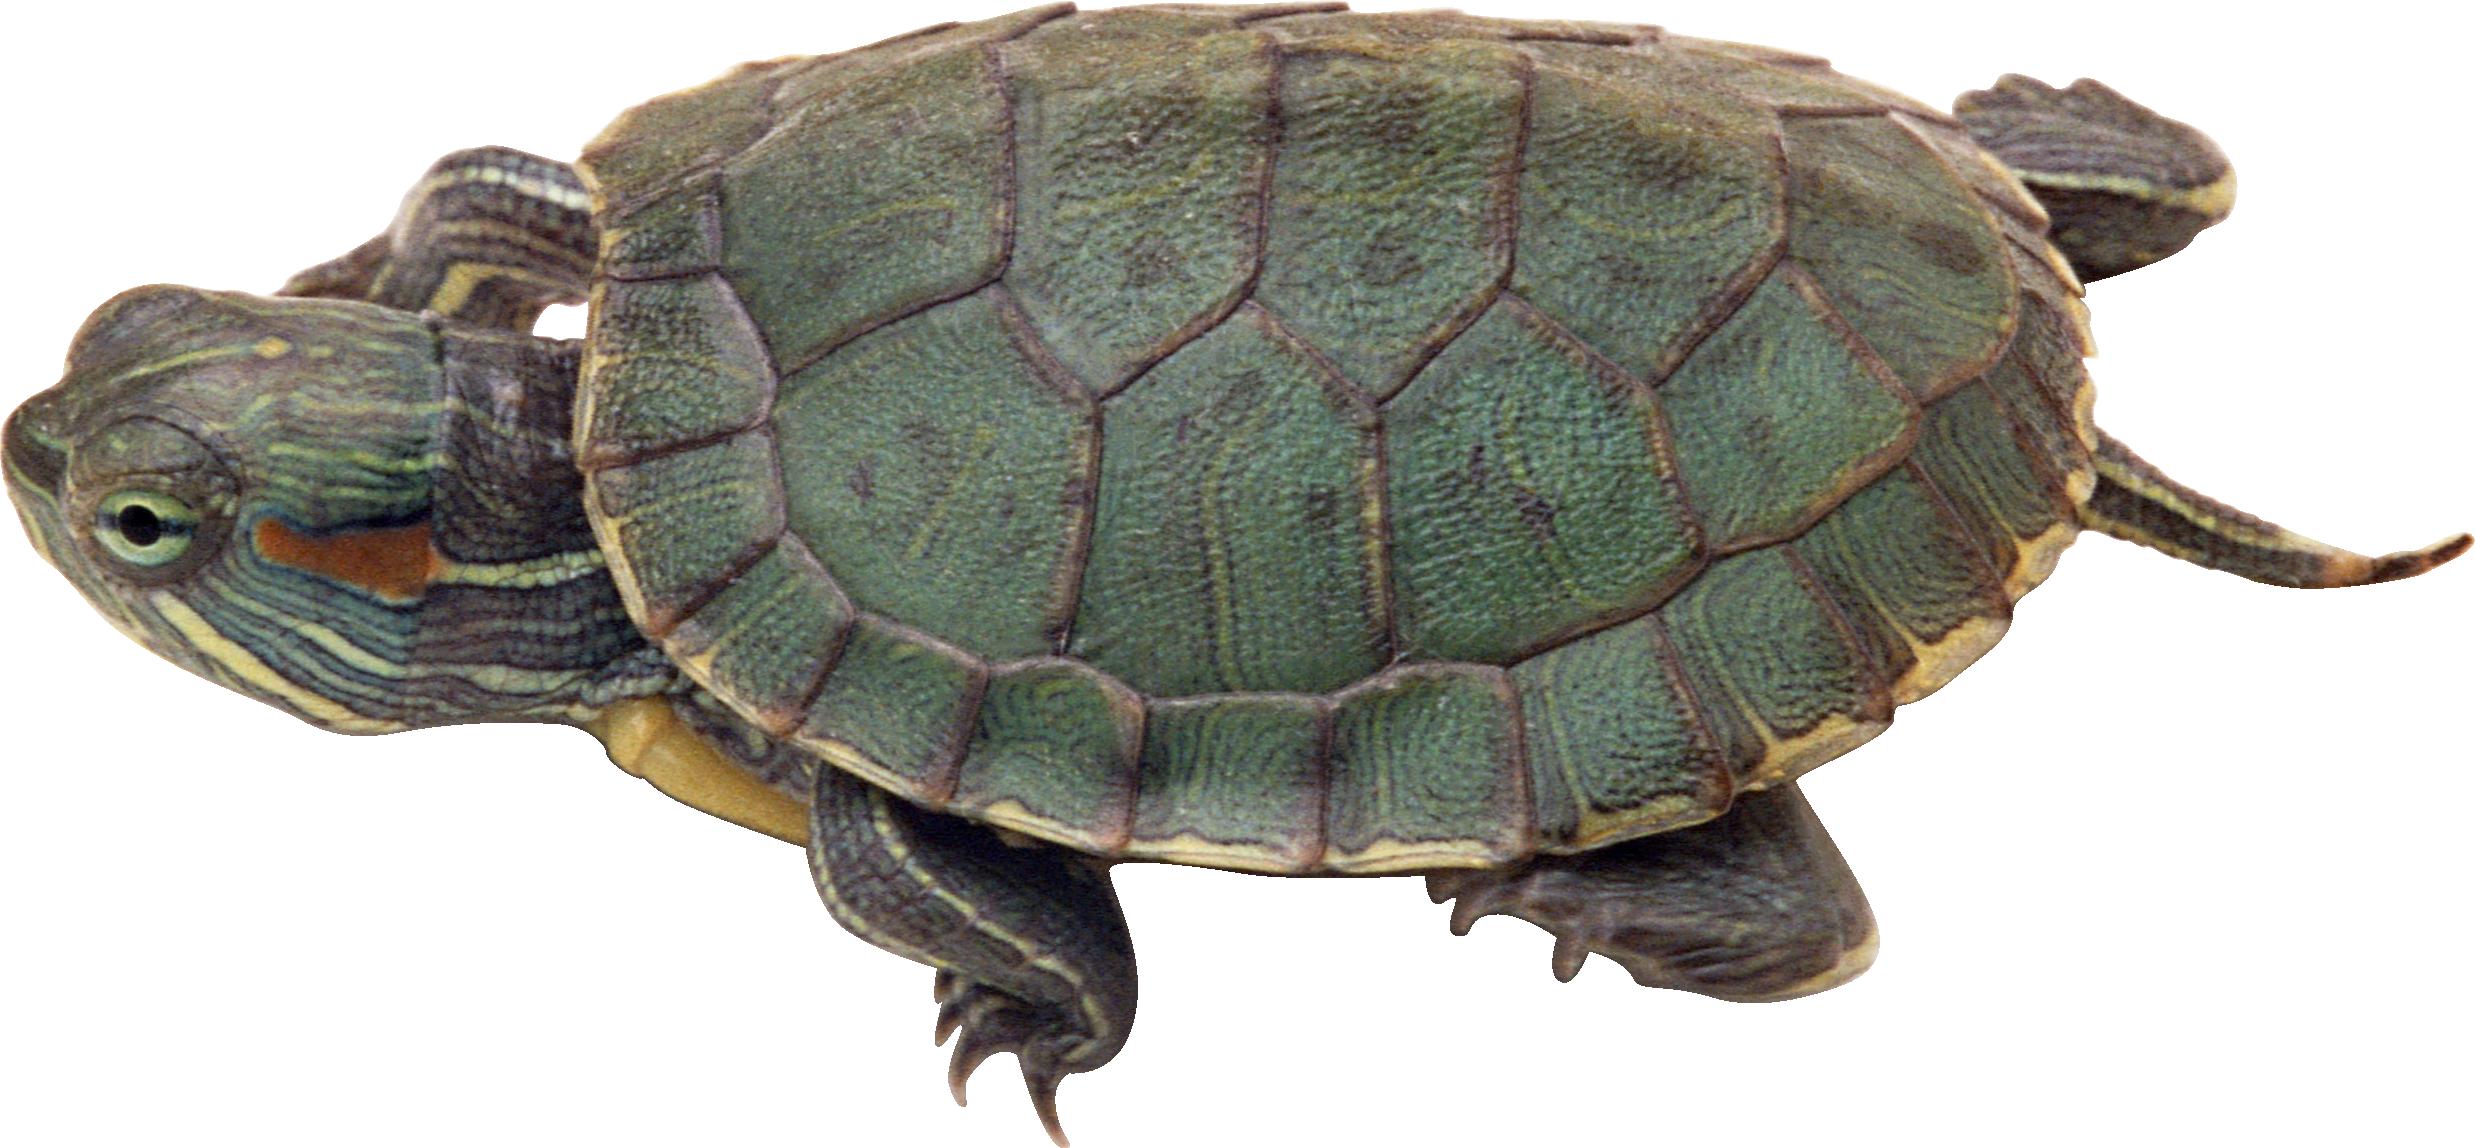 Sea Turtle Transparent PNG